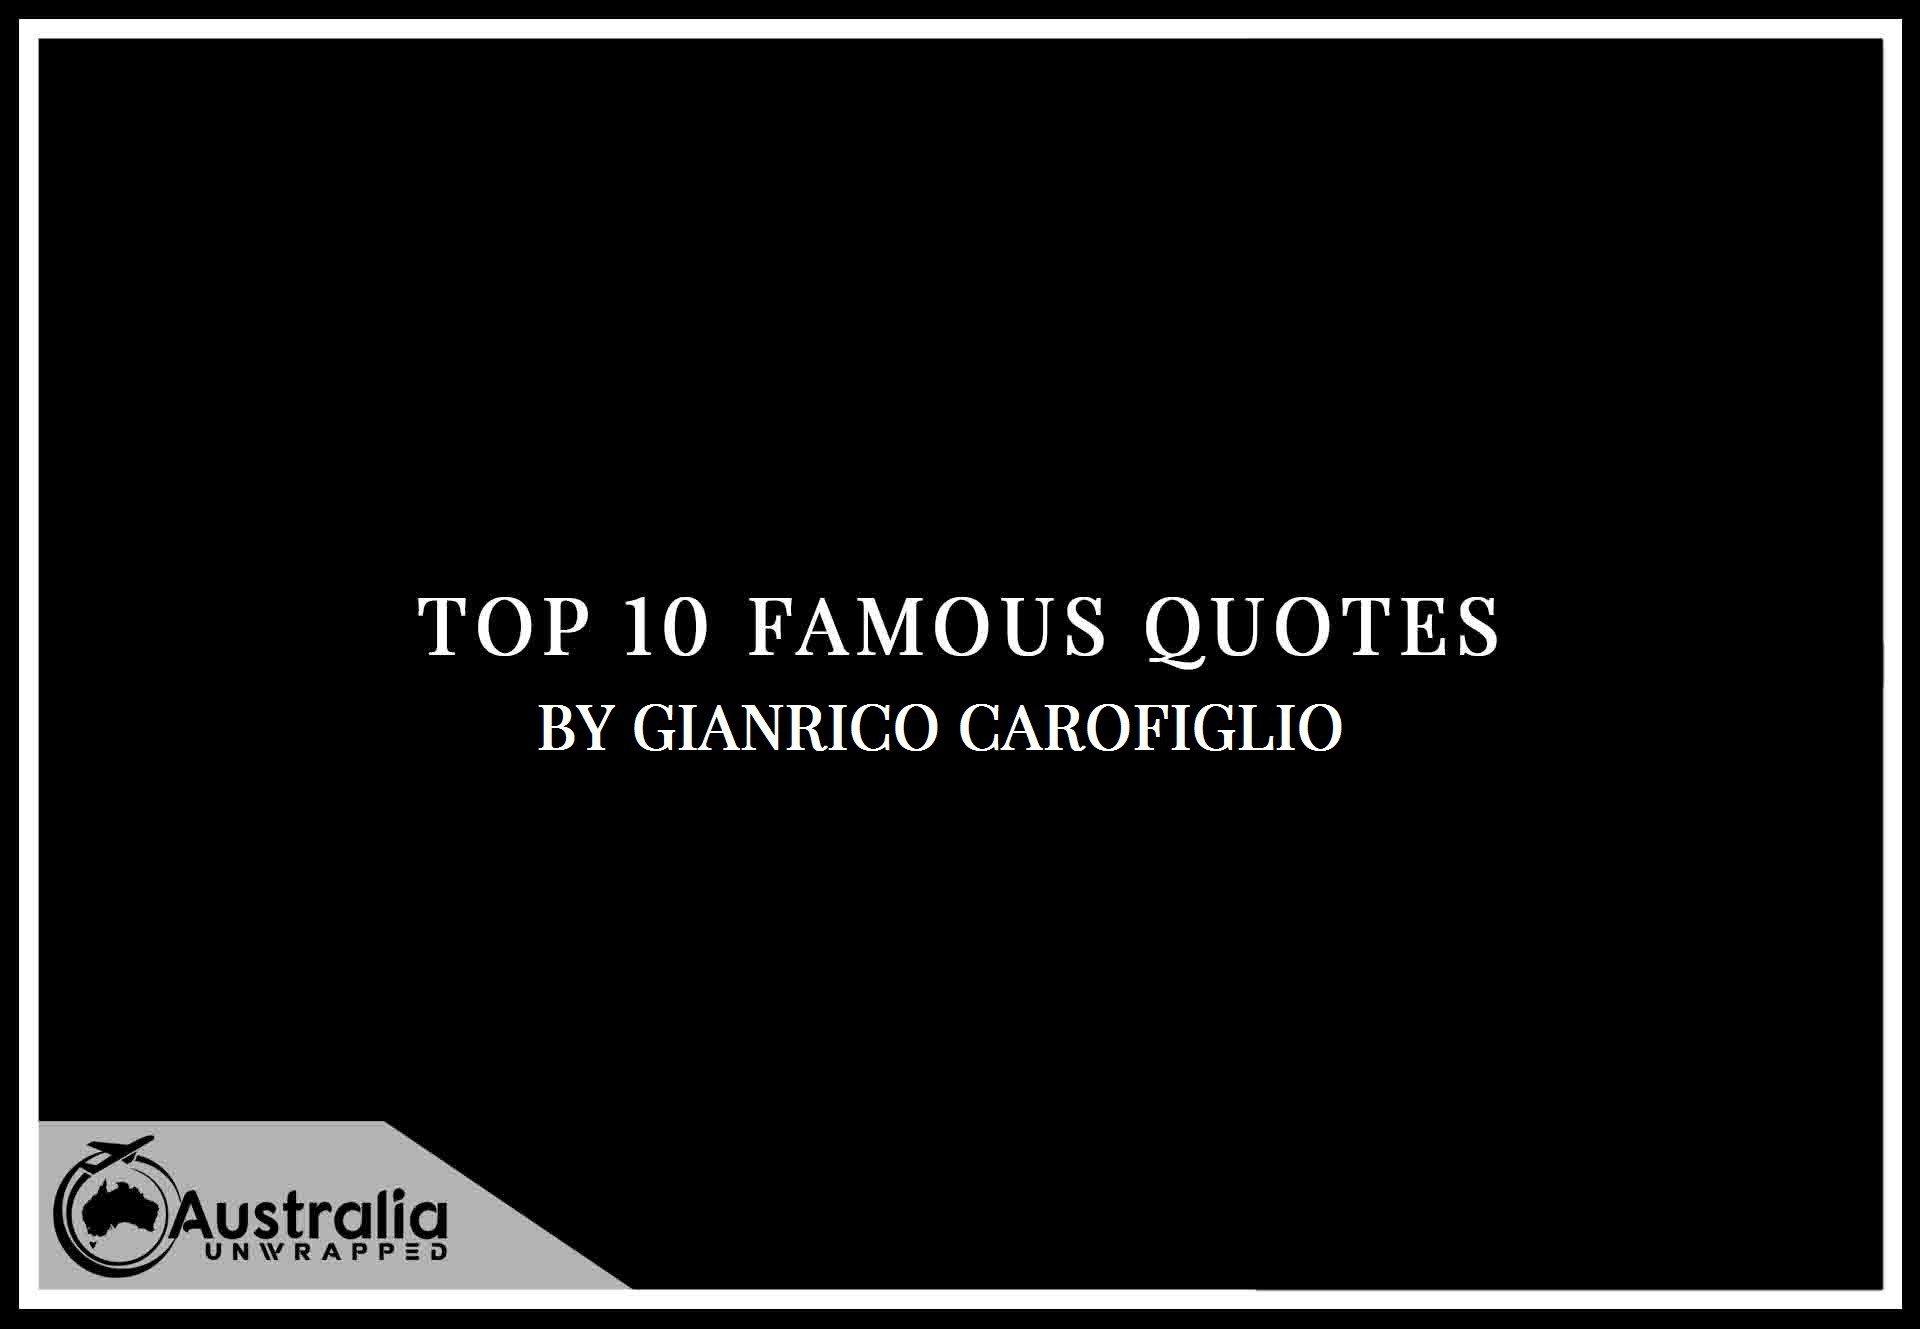 Gianrico Carofiglio's Top 10 Popular and Famous Quotes